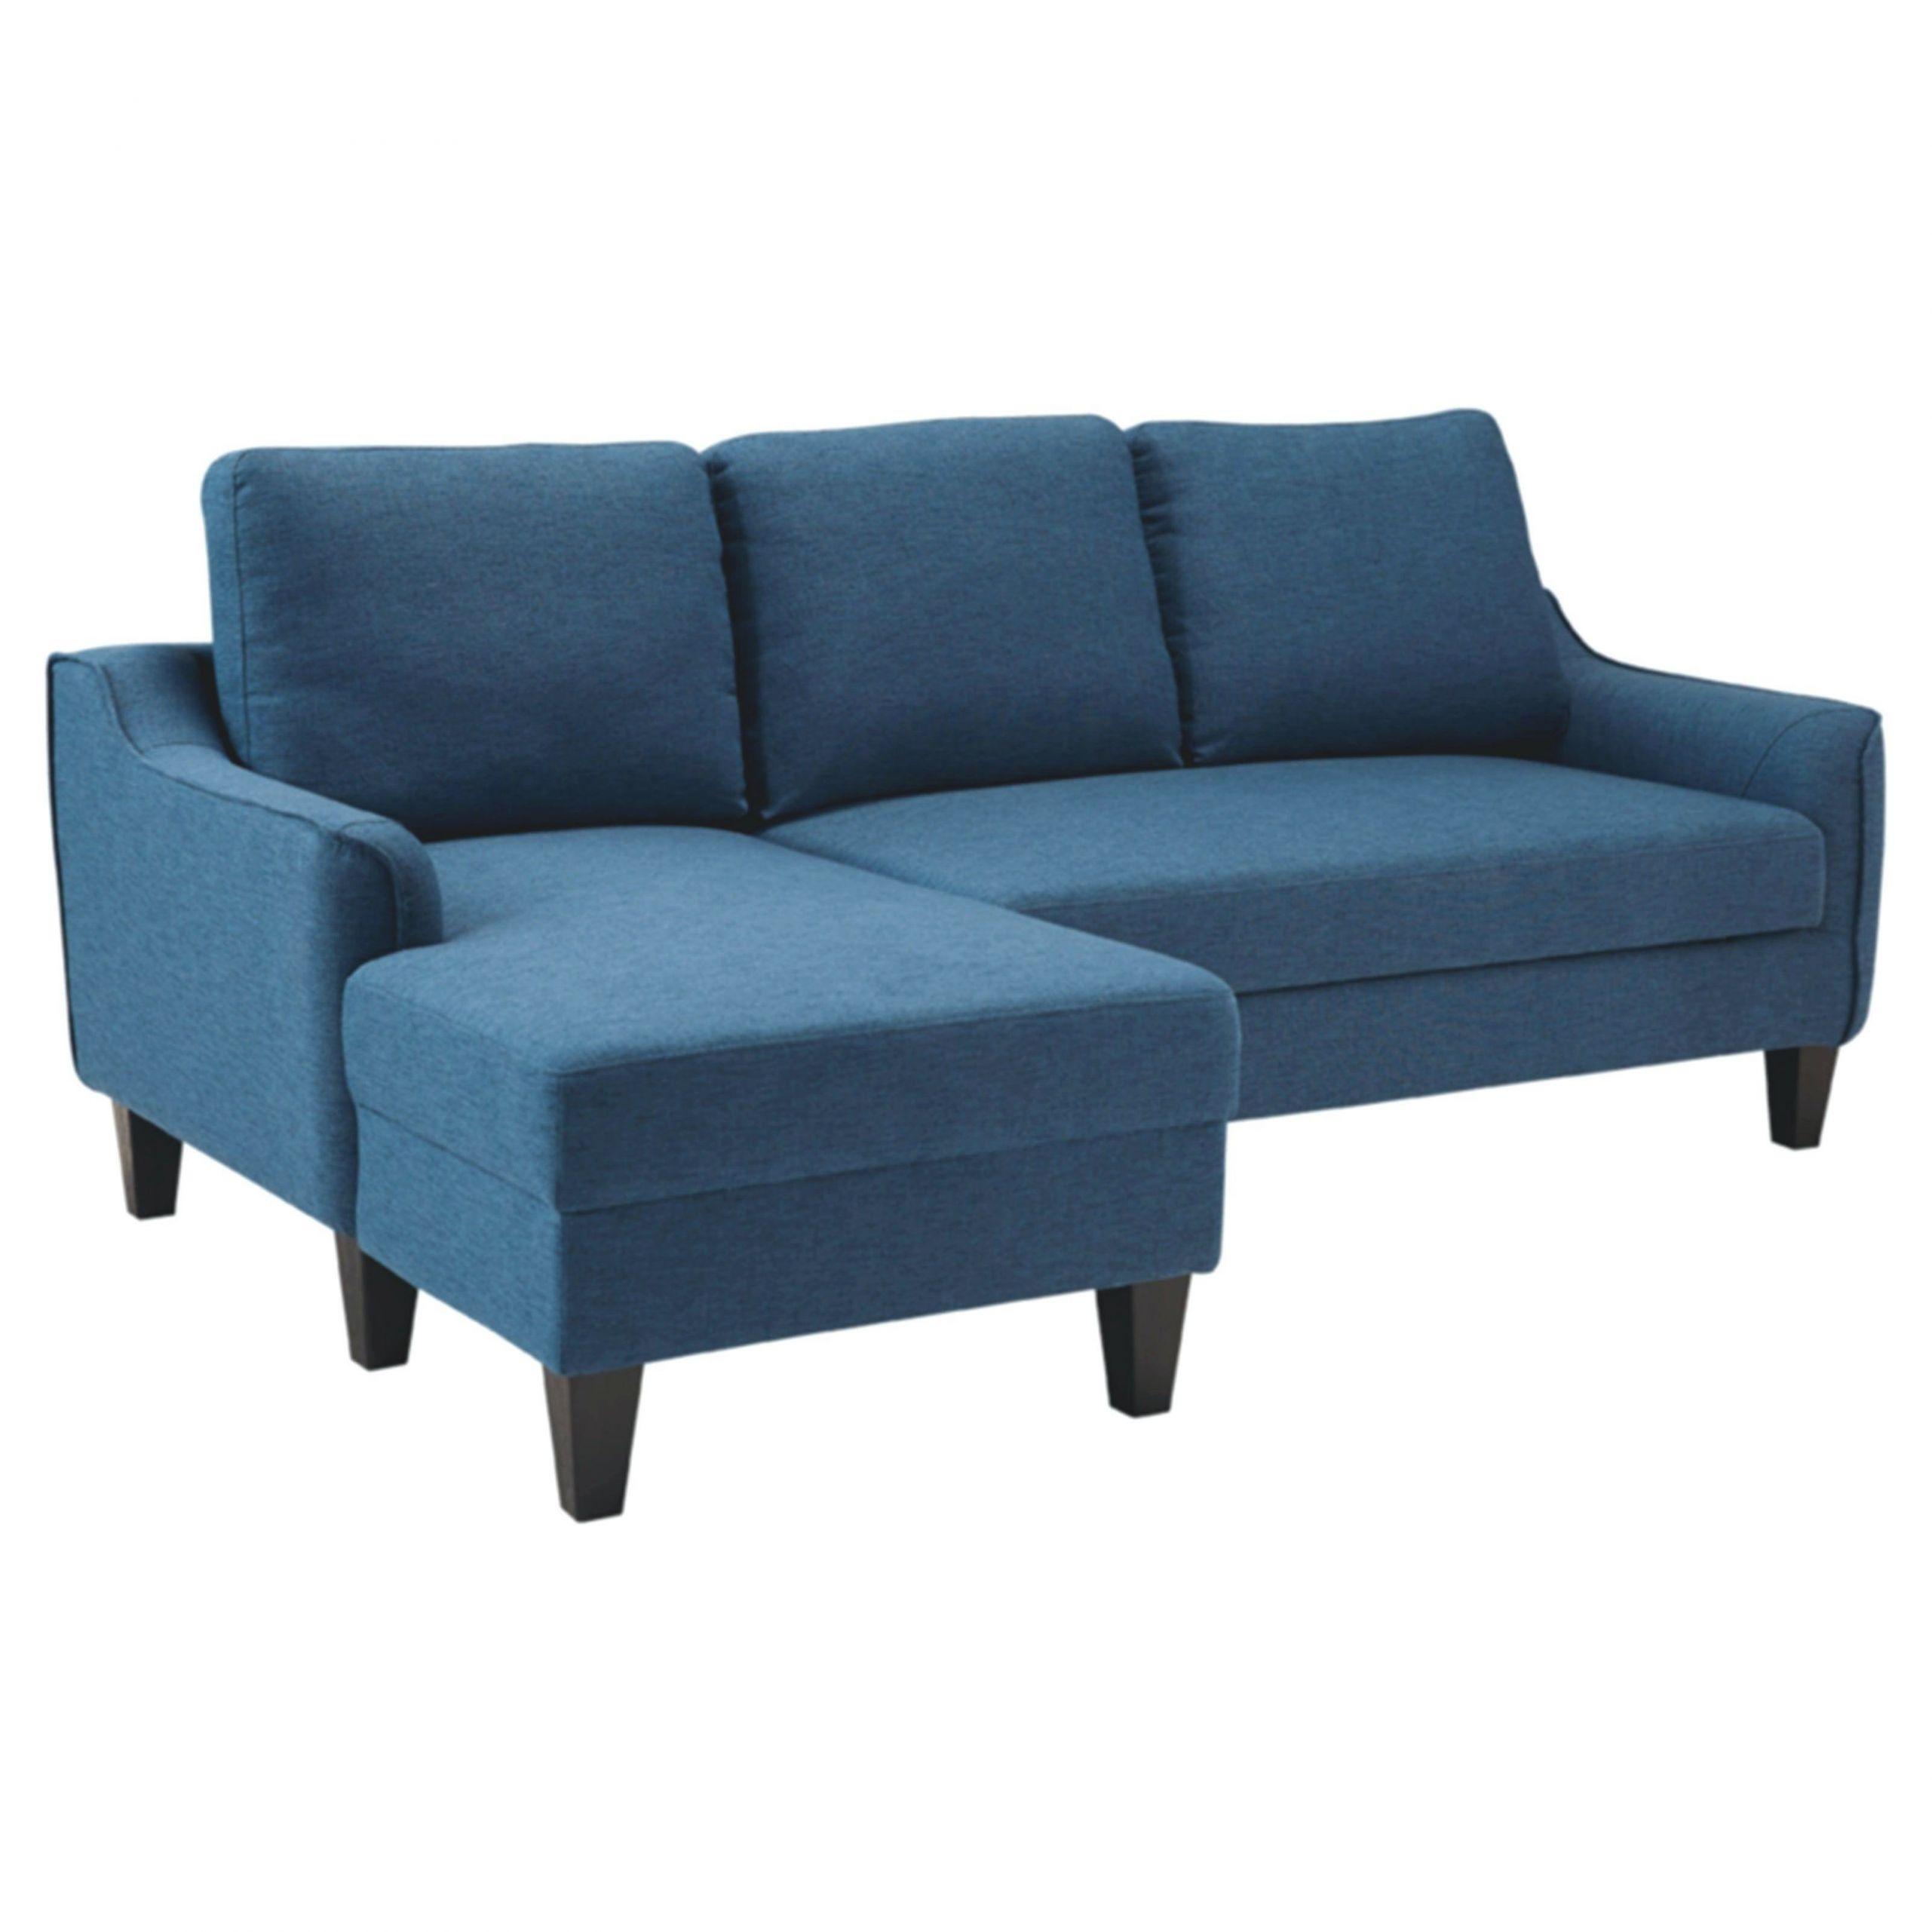 Grey Futon Couch Target Chair Sleeper